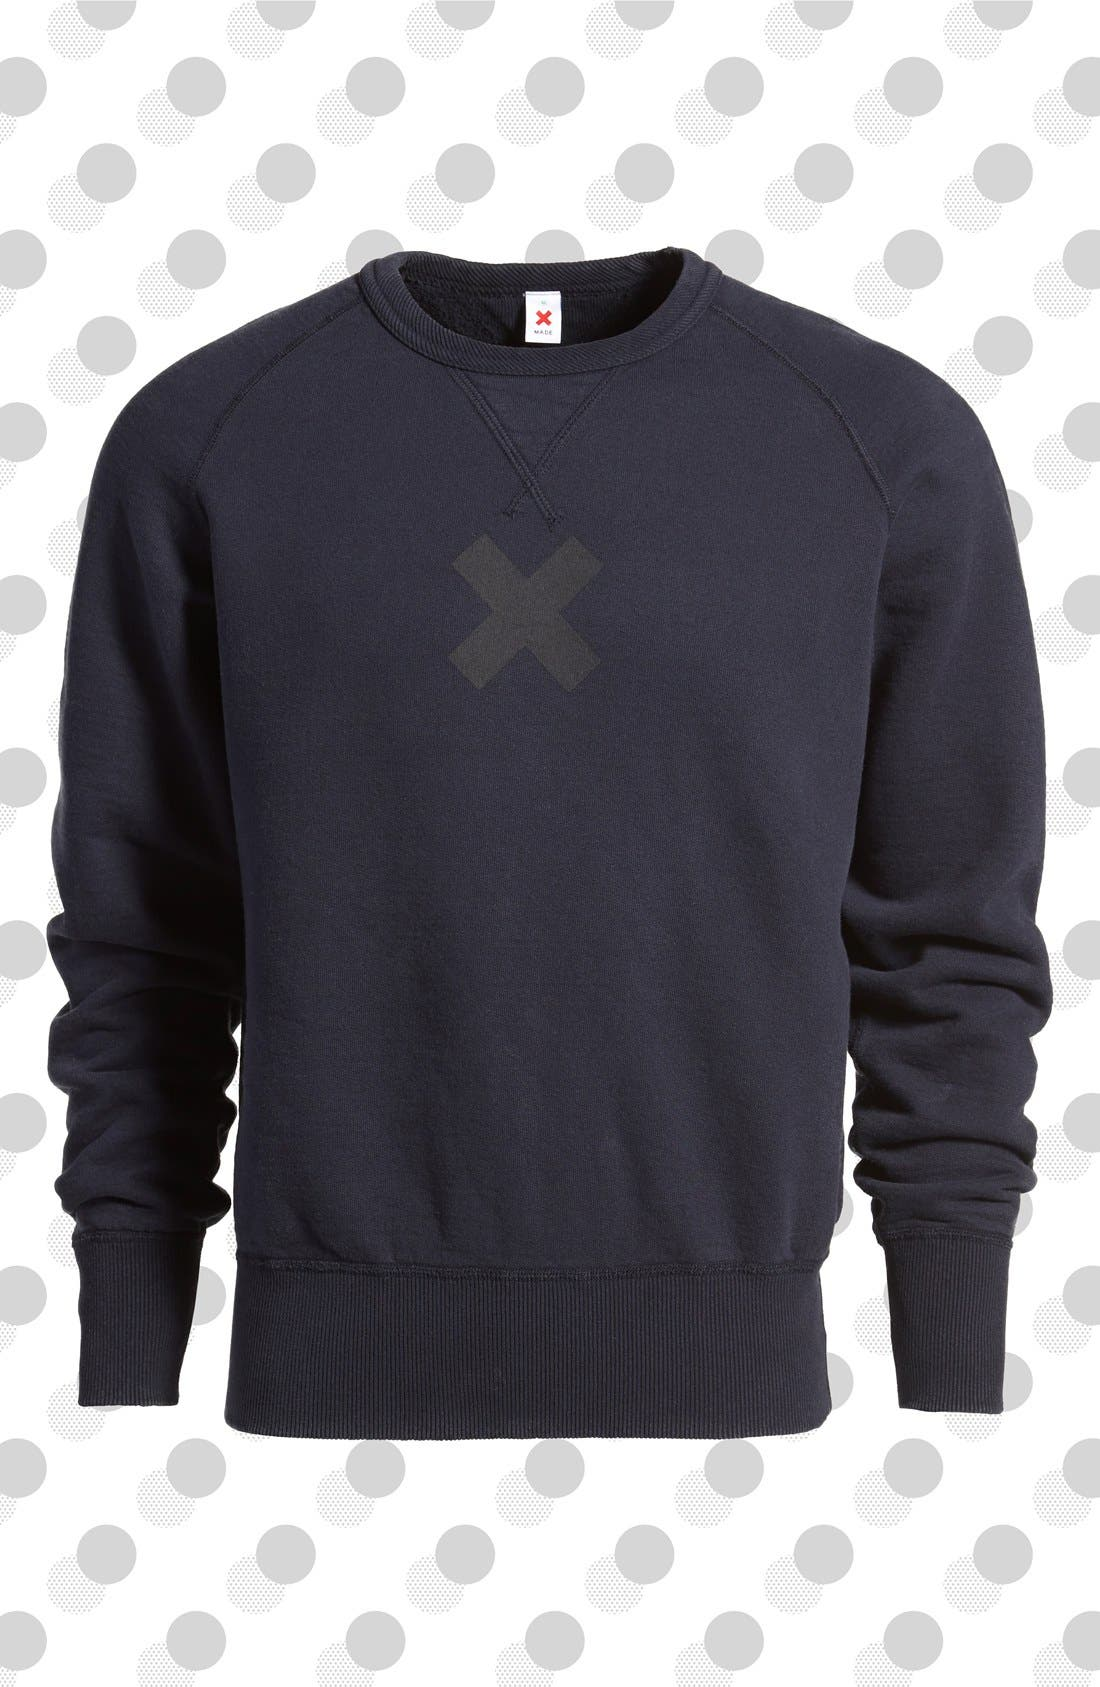 BEST MADE CO. Best Made Co '20 oz. Standard' Sweatshirt, Main, color, 400